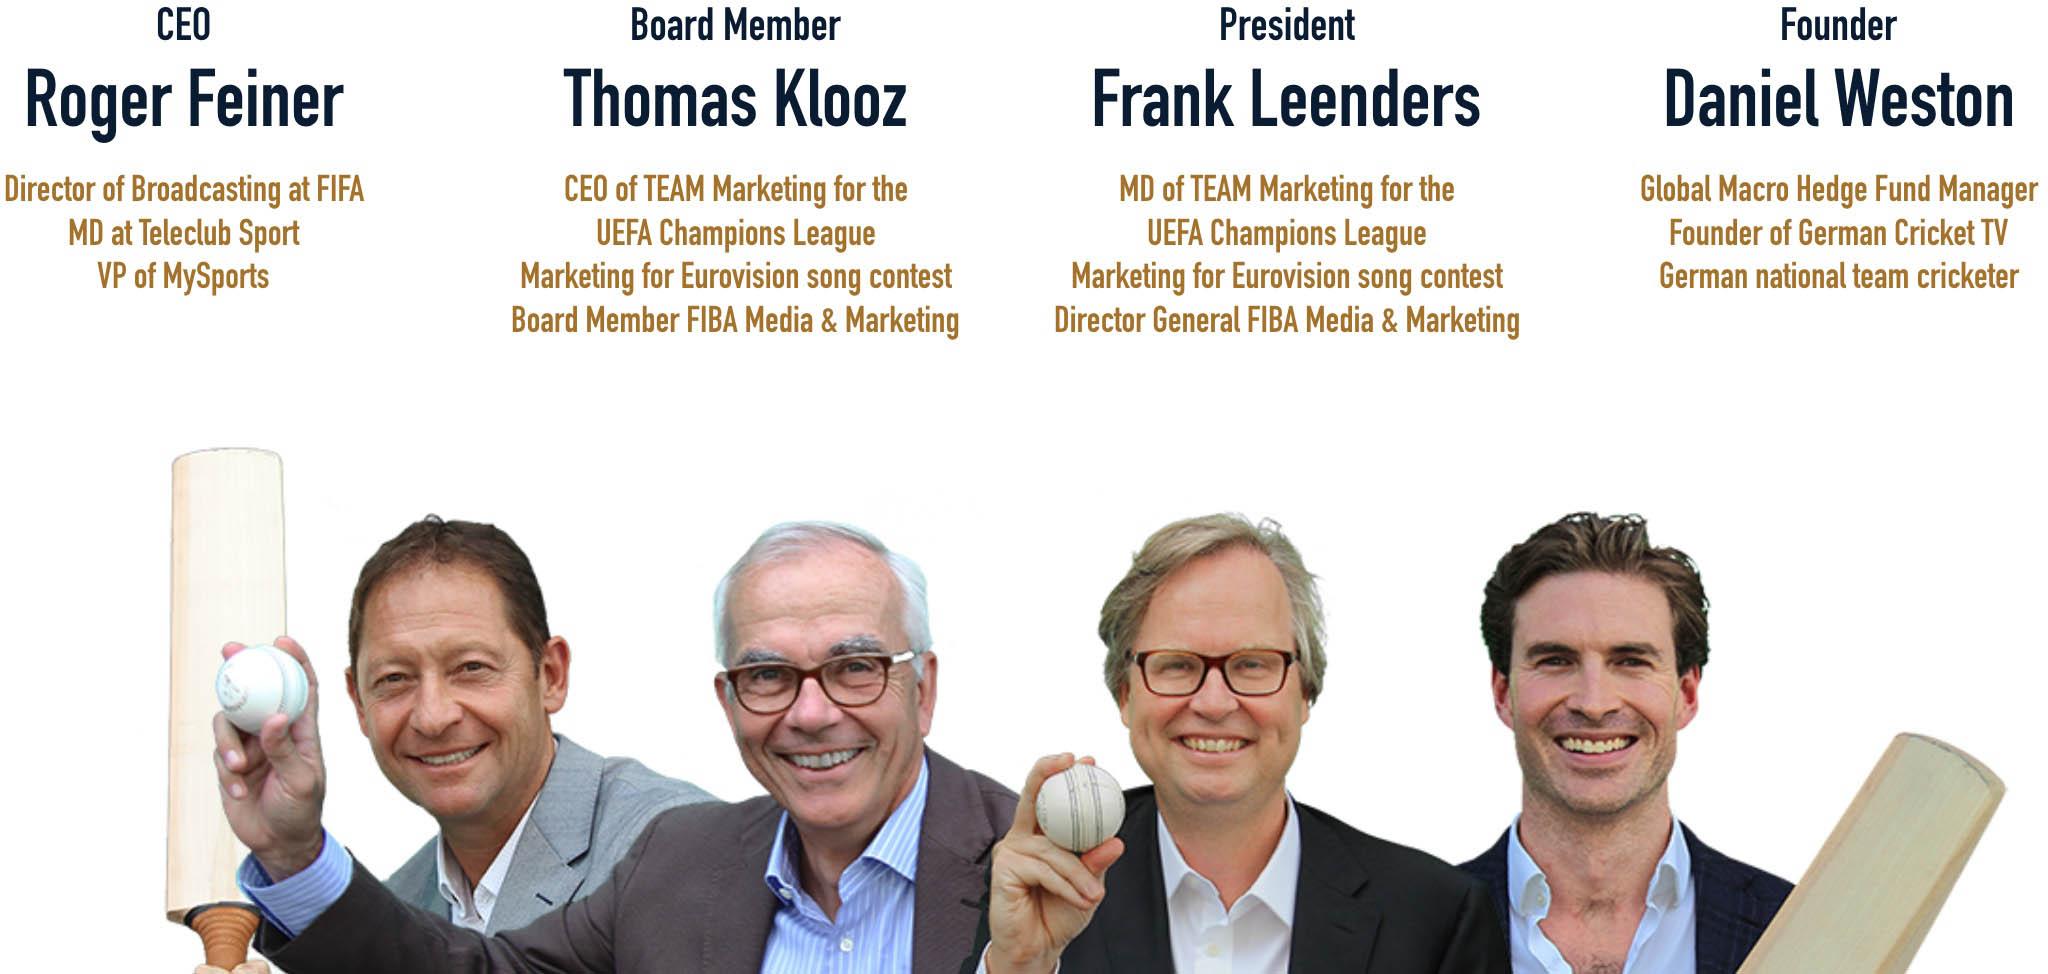 European Cricket League - Roger Feiner, Thomas Klooz, Frank Leenders, Daniel Weston